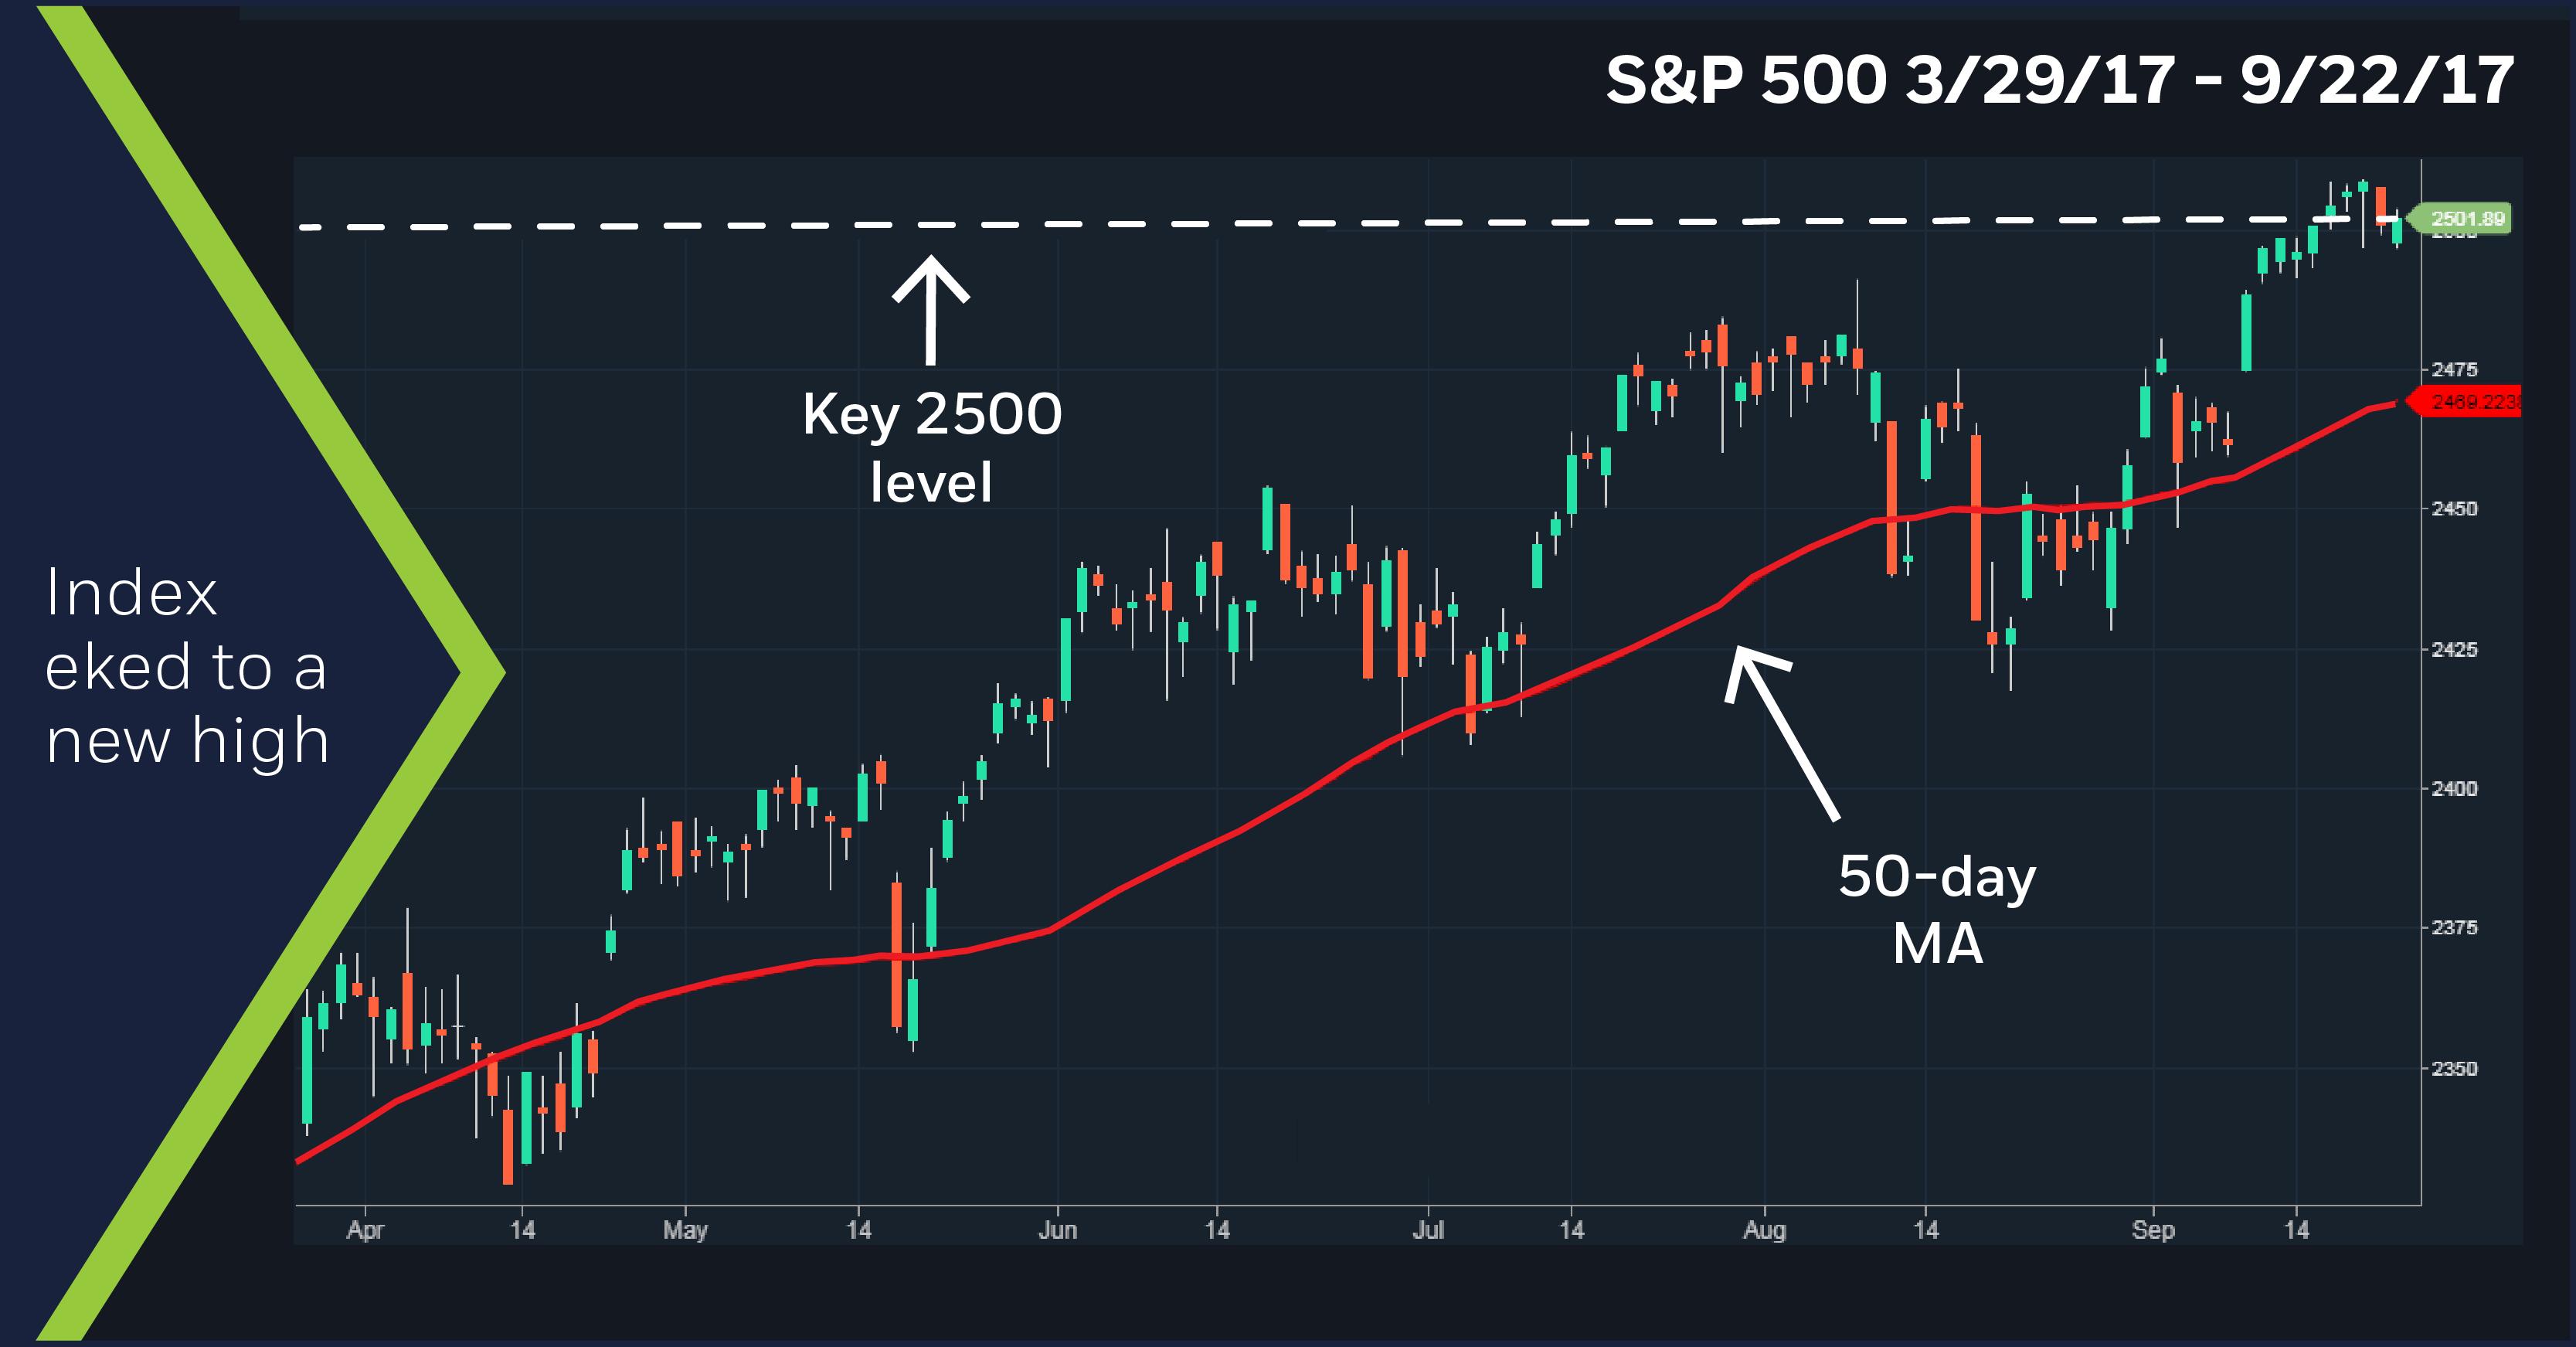 S&P 500, 3/29/17 - 9/22/17